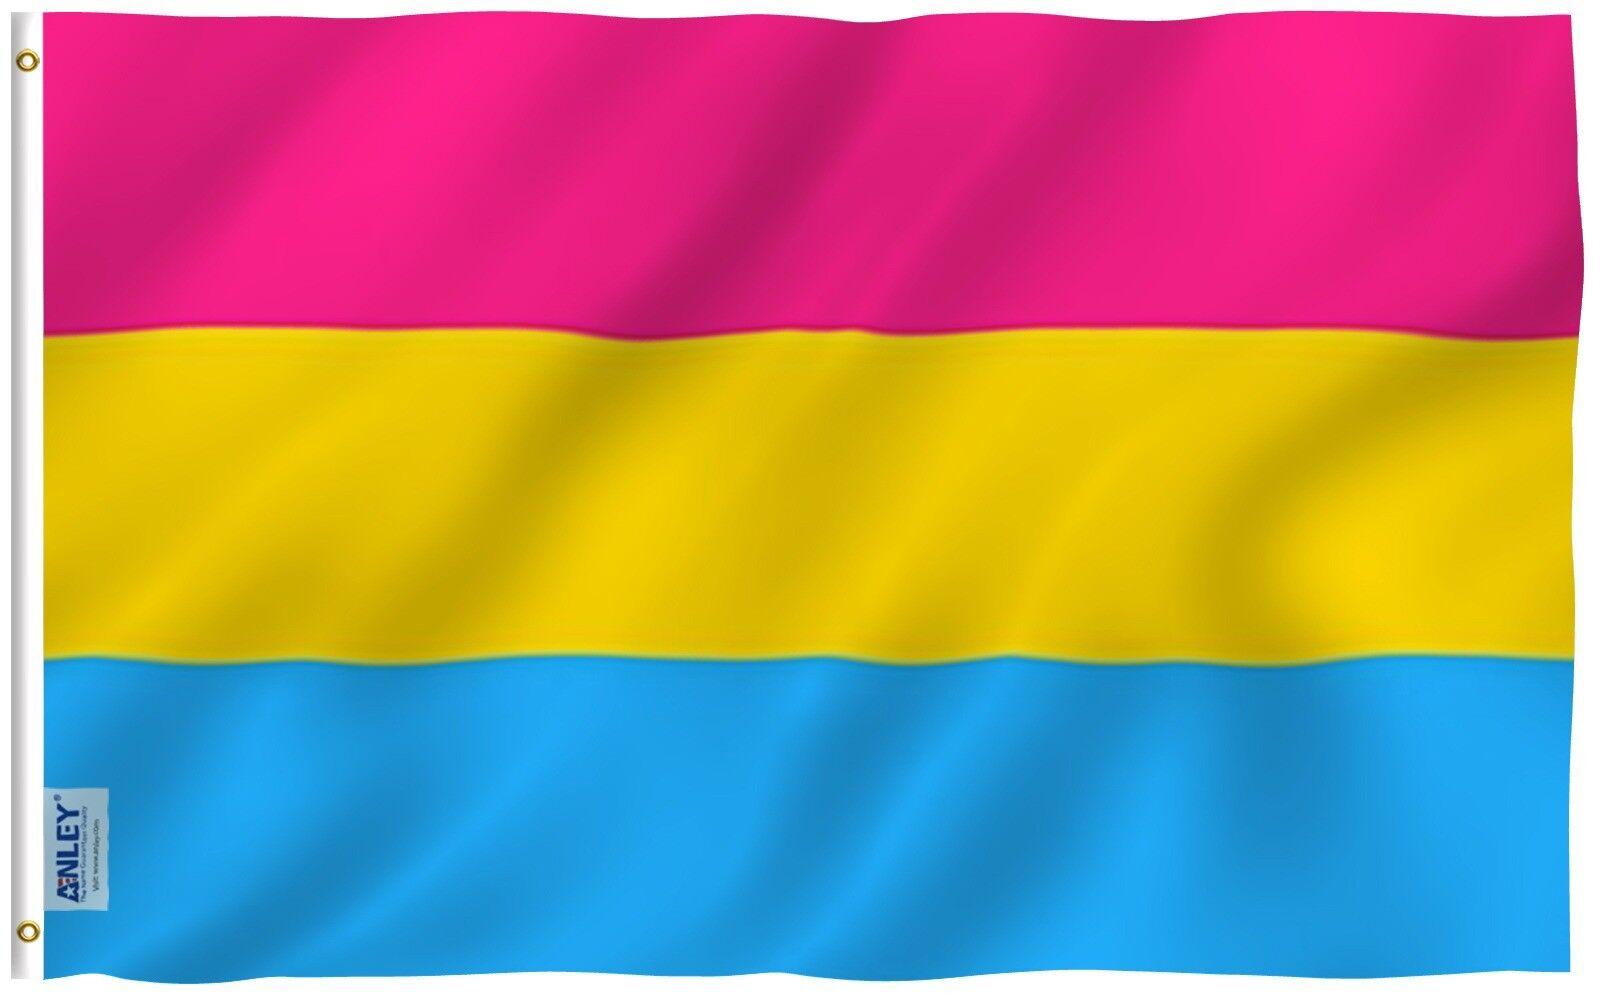 ANLEY Fly Breeze 3x5 Foot Pansexual Pride Flag Omnisexual LG